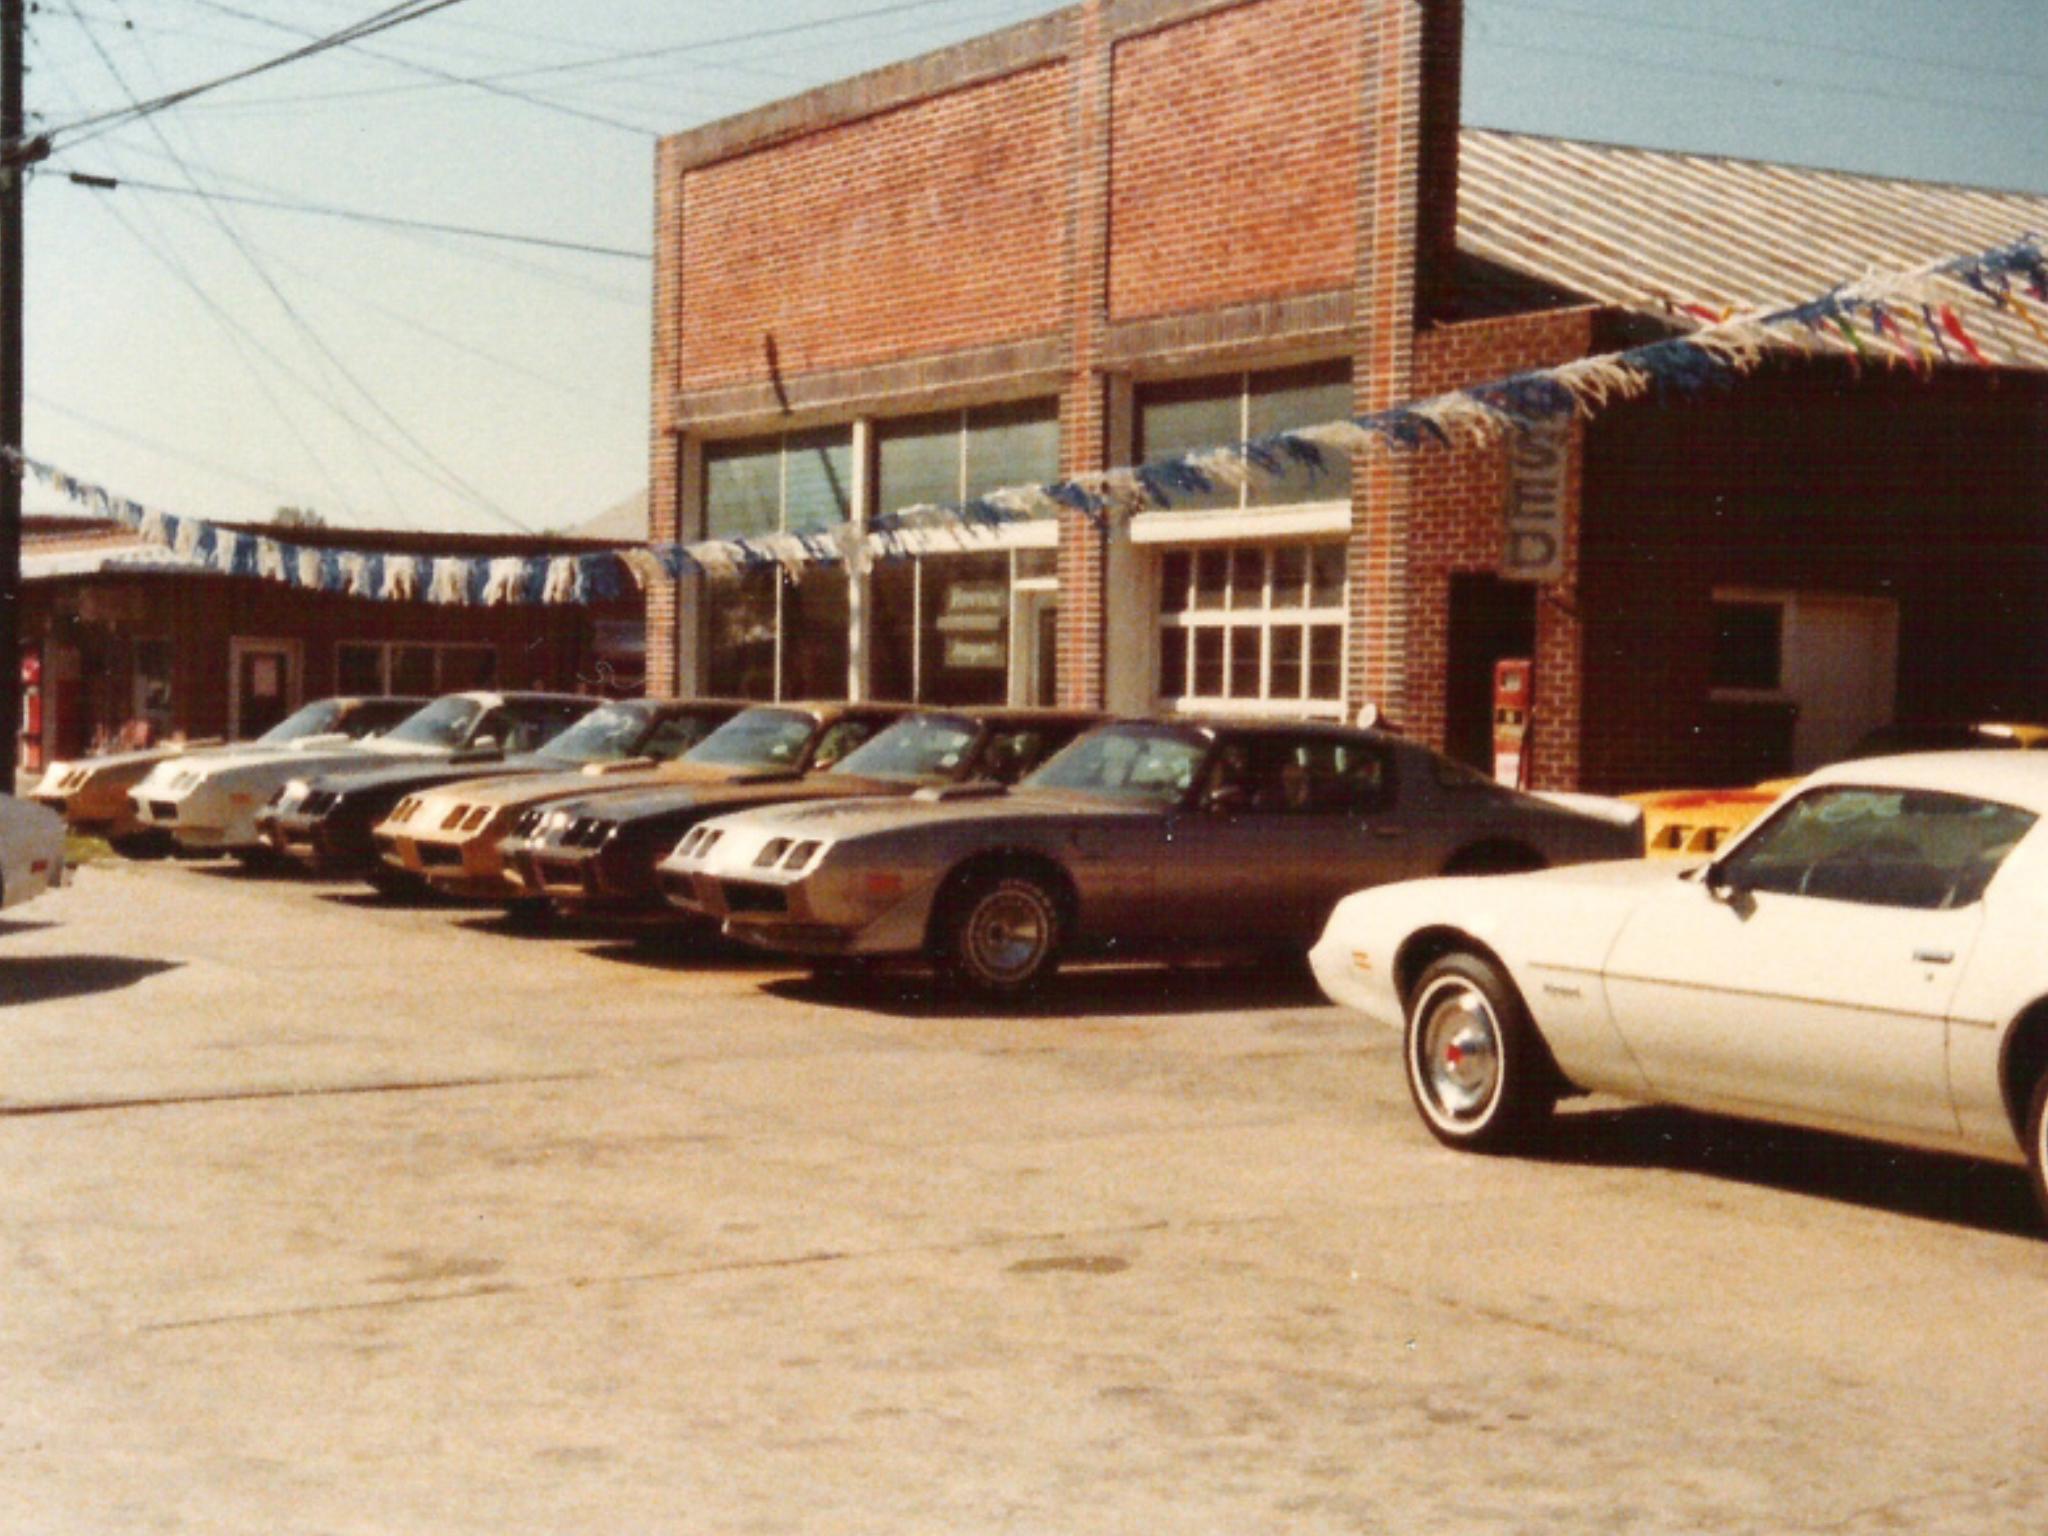 1979 Pontiac Dealership Darlington South Carolina Car Dealership Dealership Chevrolet Dealership